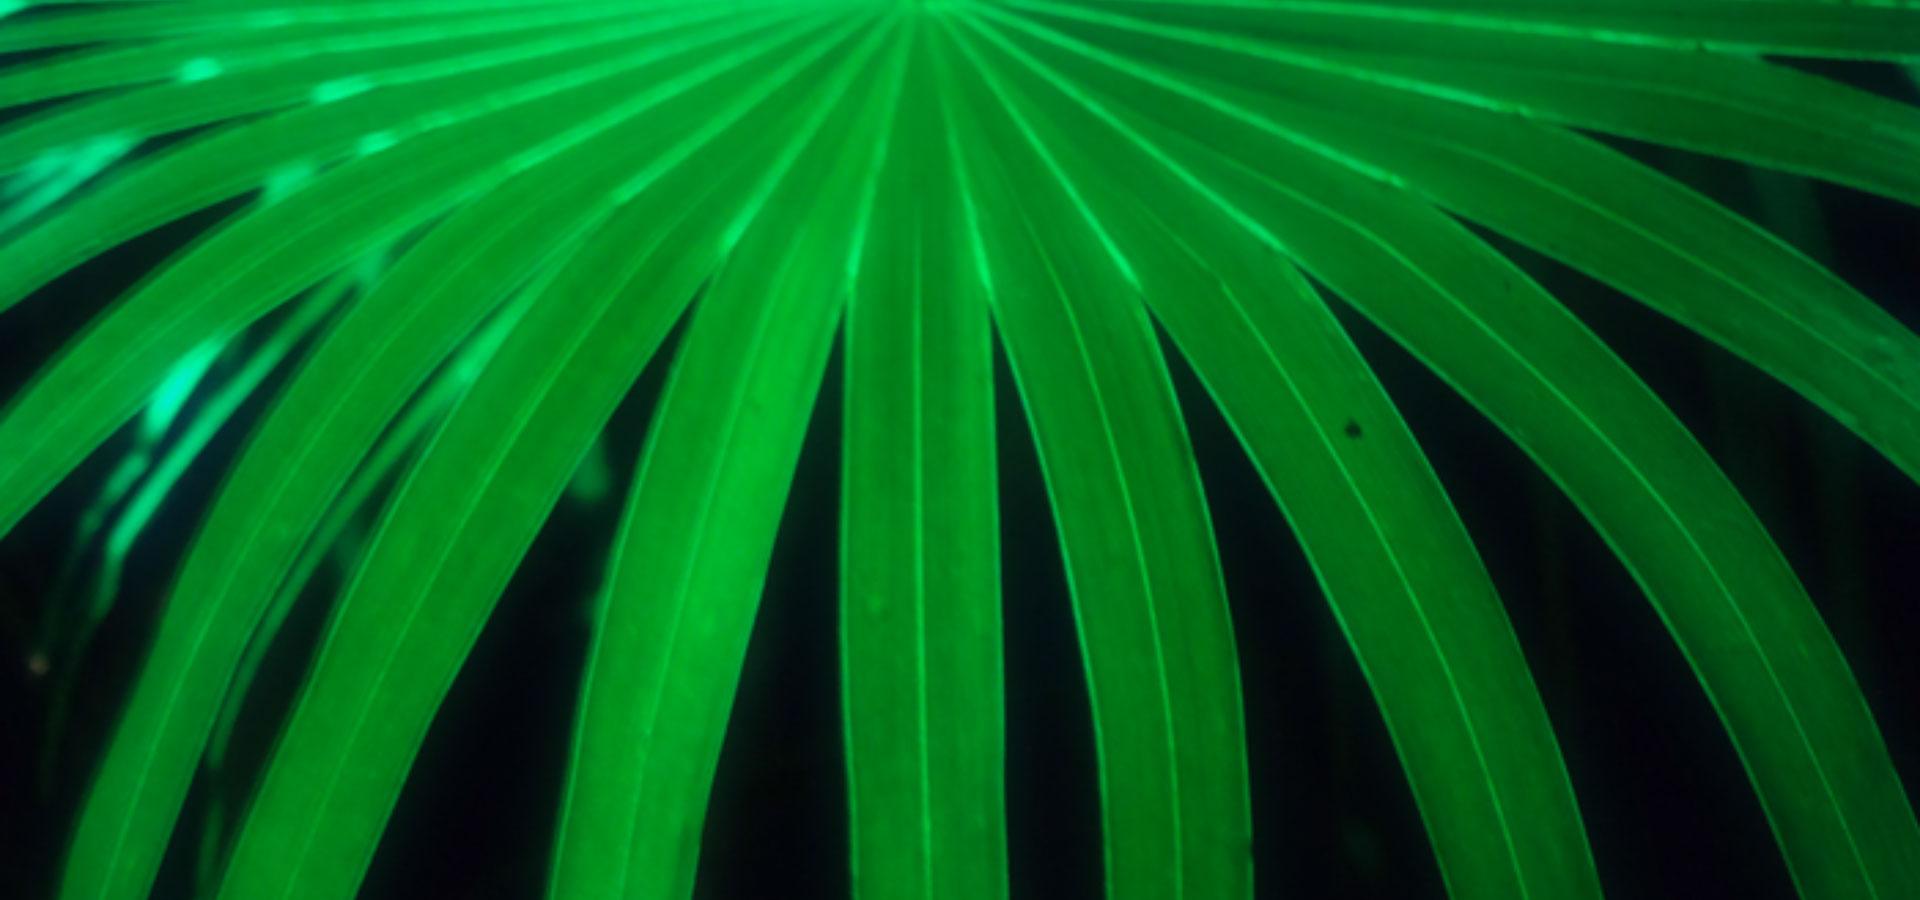 Photo of leaf by Ohlsson/Dit-Cilinn